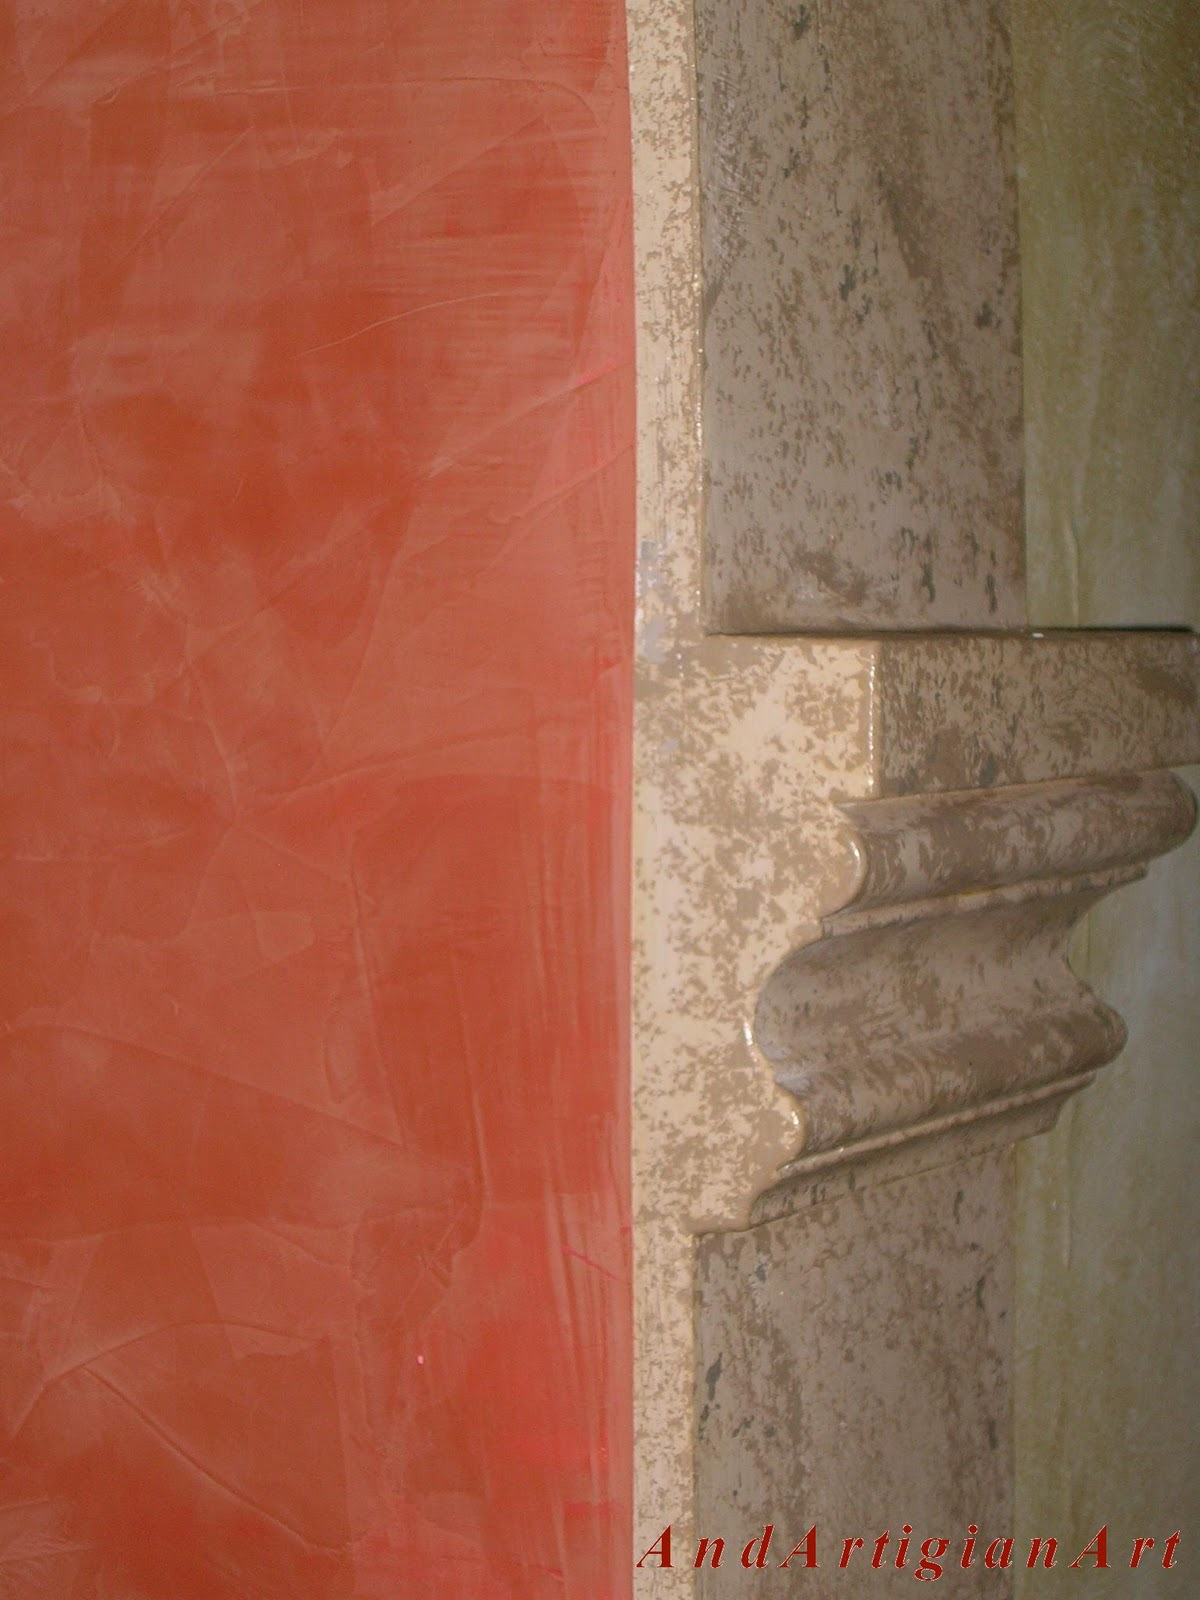 Andartigianart - Marmo veneziano ...